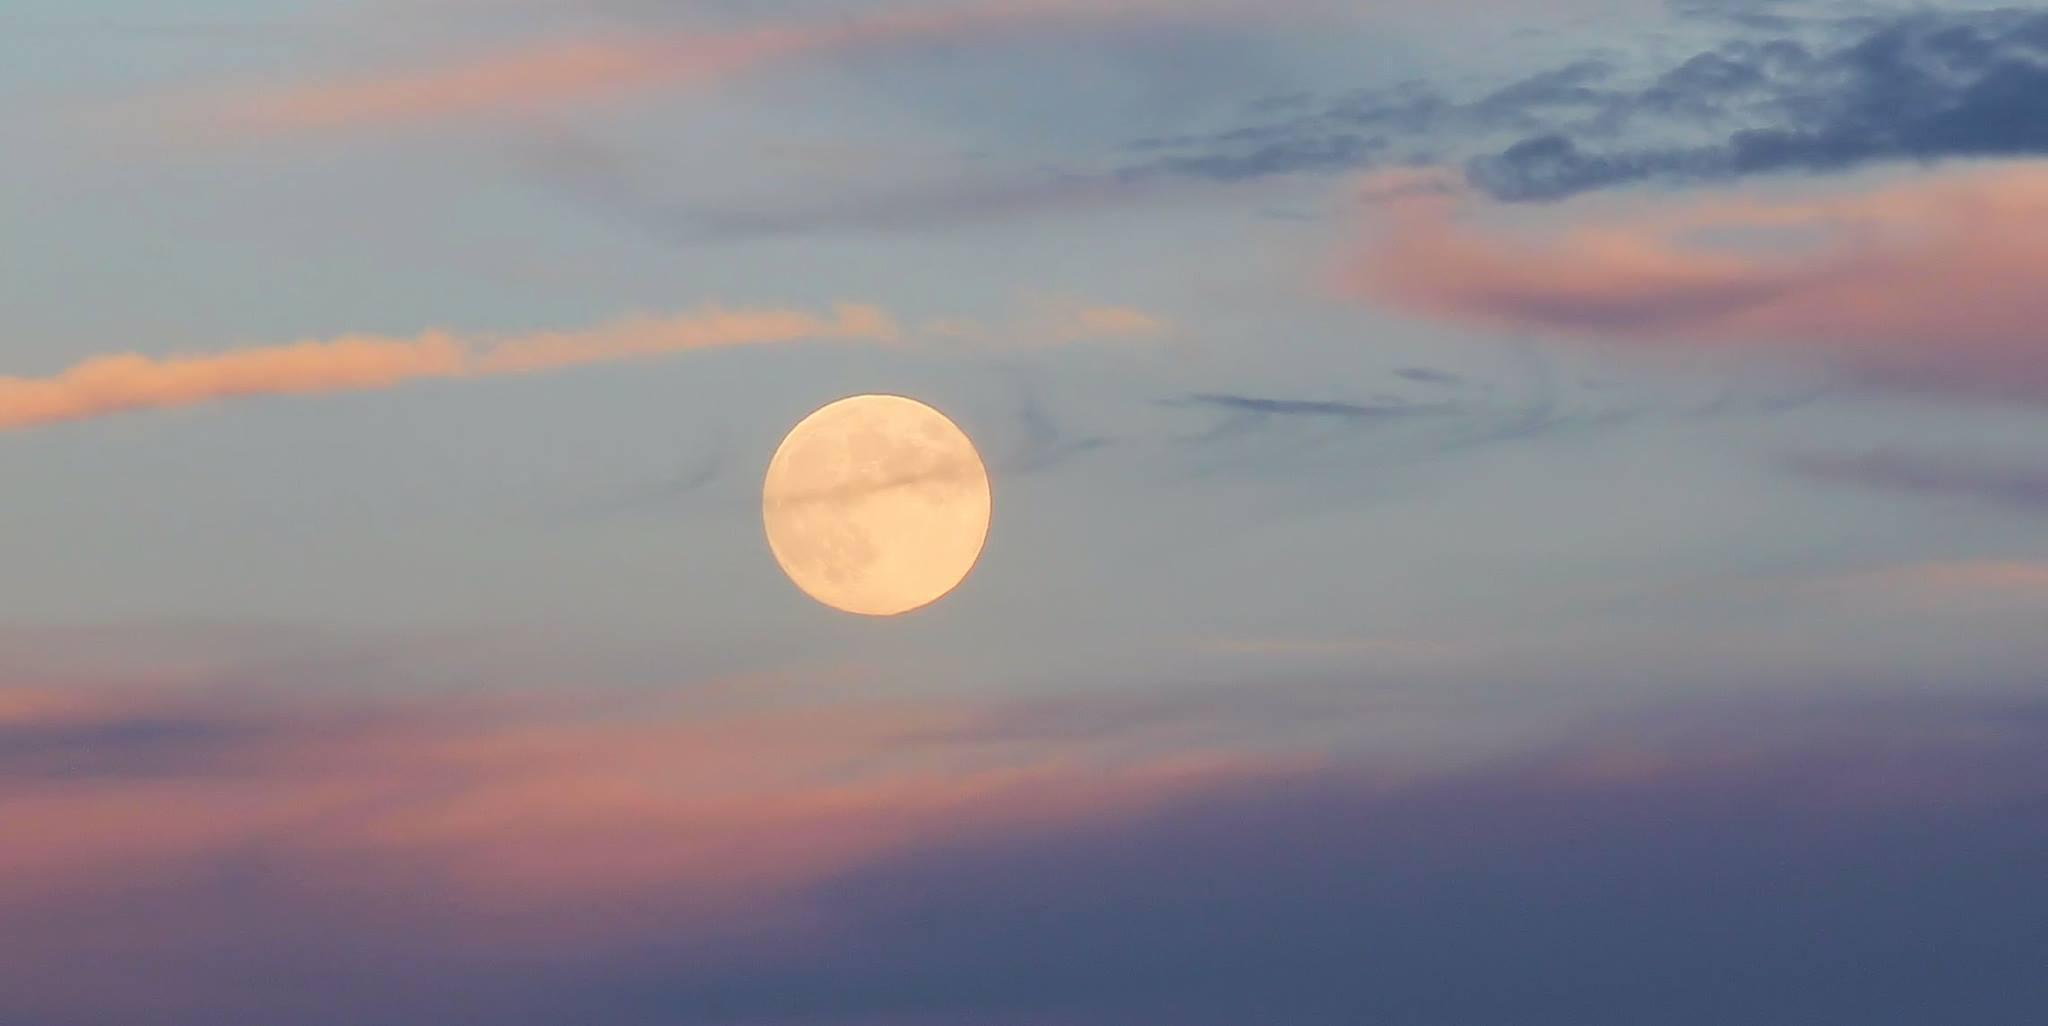 September 2013: Best Photos Of Past Harvest Moons On EarthSky